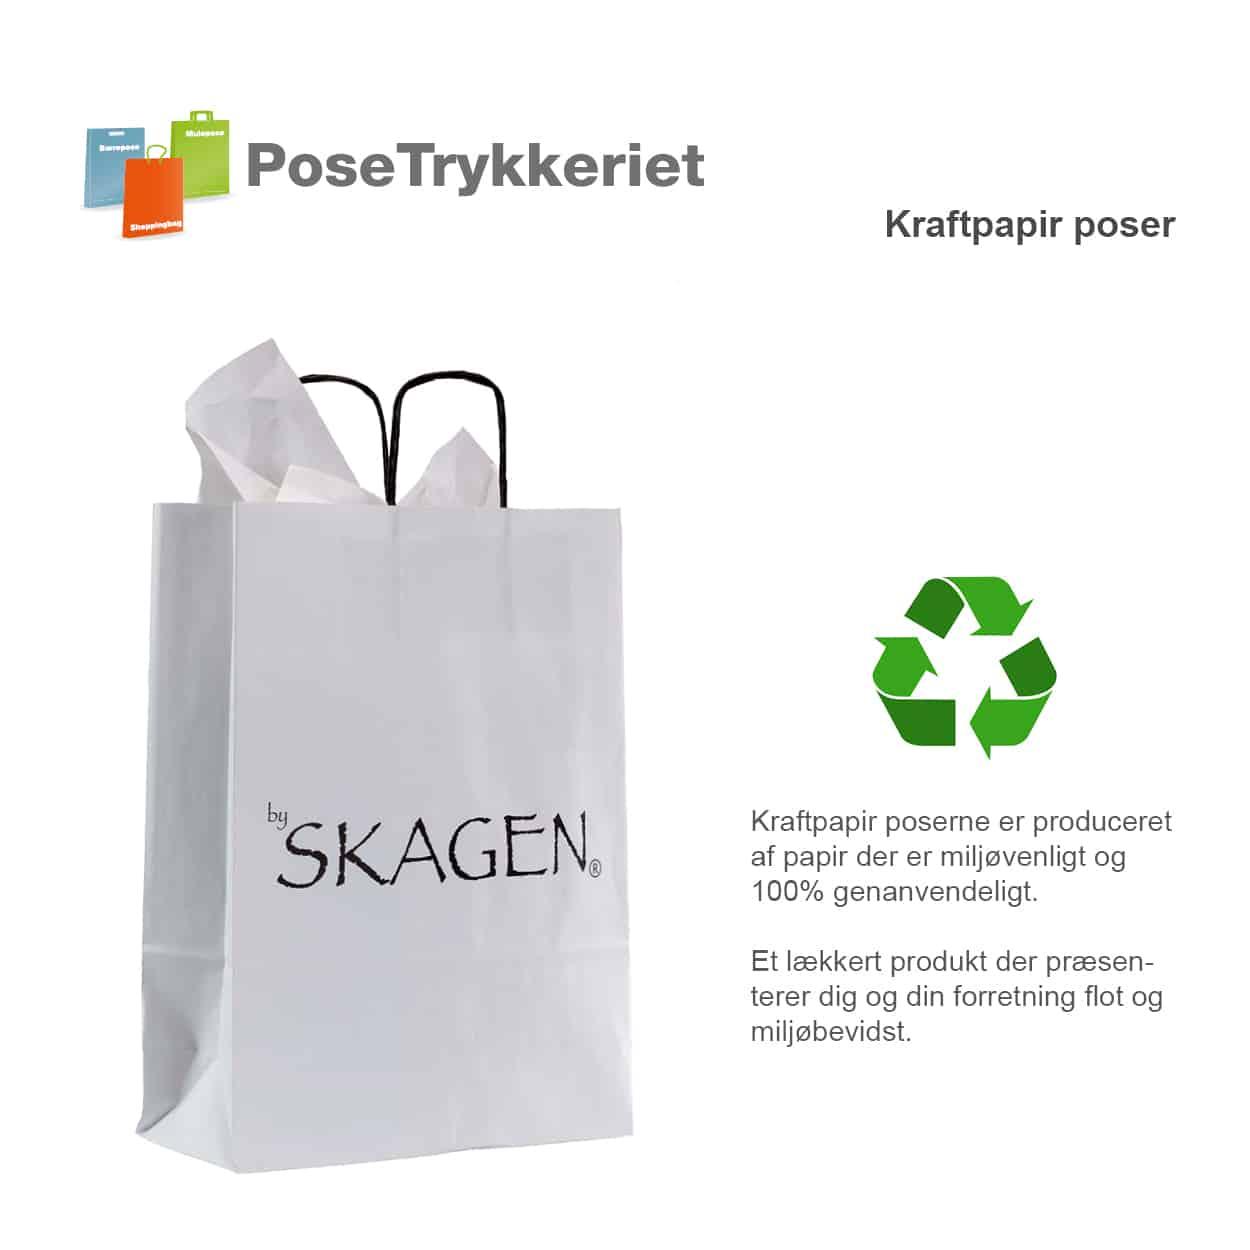 Papirposer med logotryk. Posetrykkeriet.dk